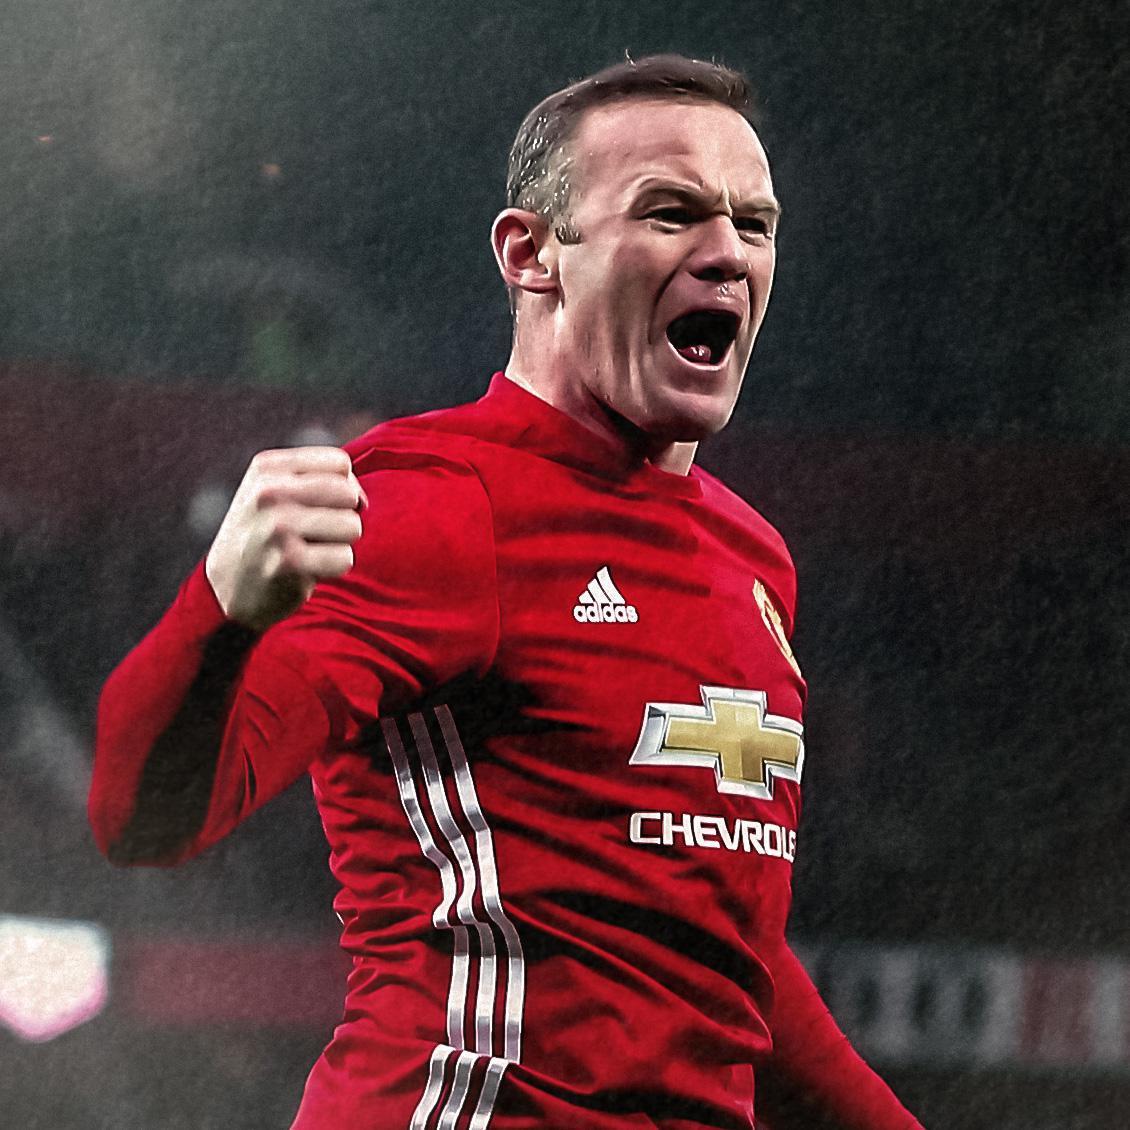 Legends-Profile_Wayne-Rooney1523460268000